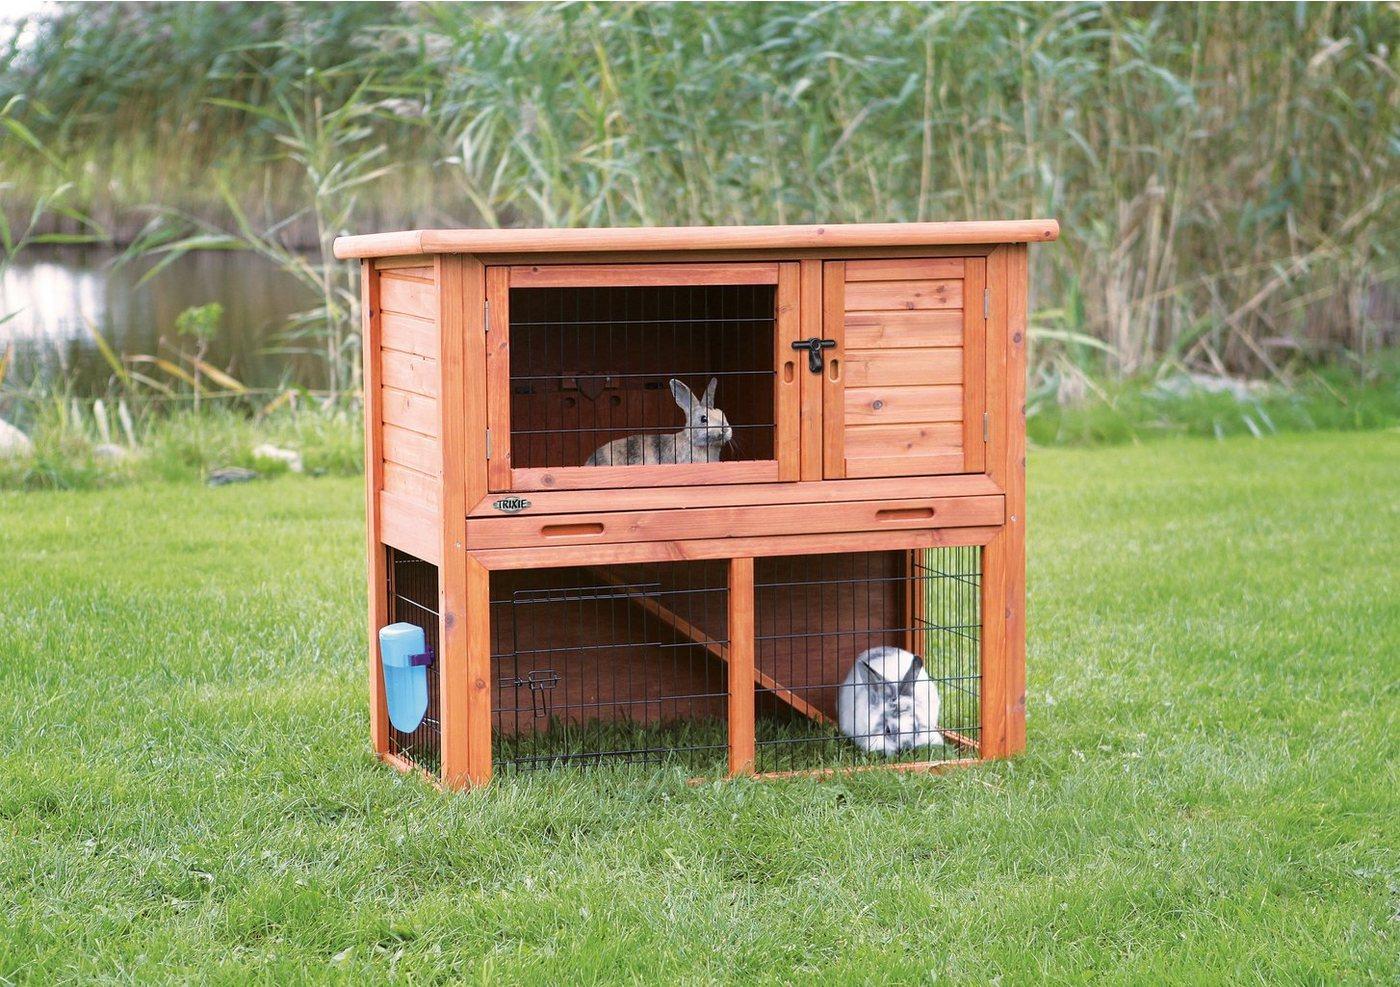 trixie kaninchenstall natura mit freigehege 116x63x97 cm. Black Bedroom Furniture Sets. Home Design Ideas